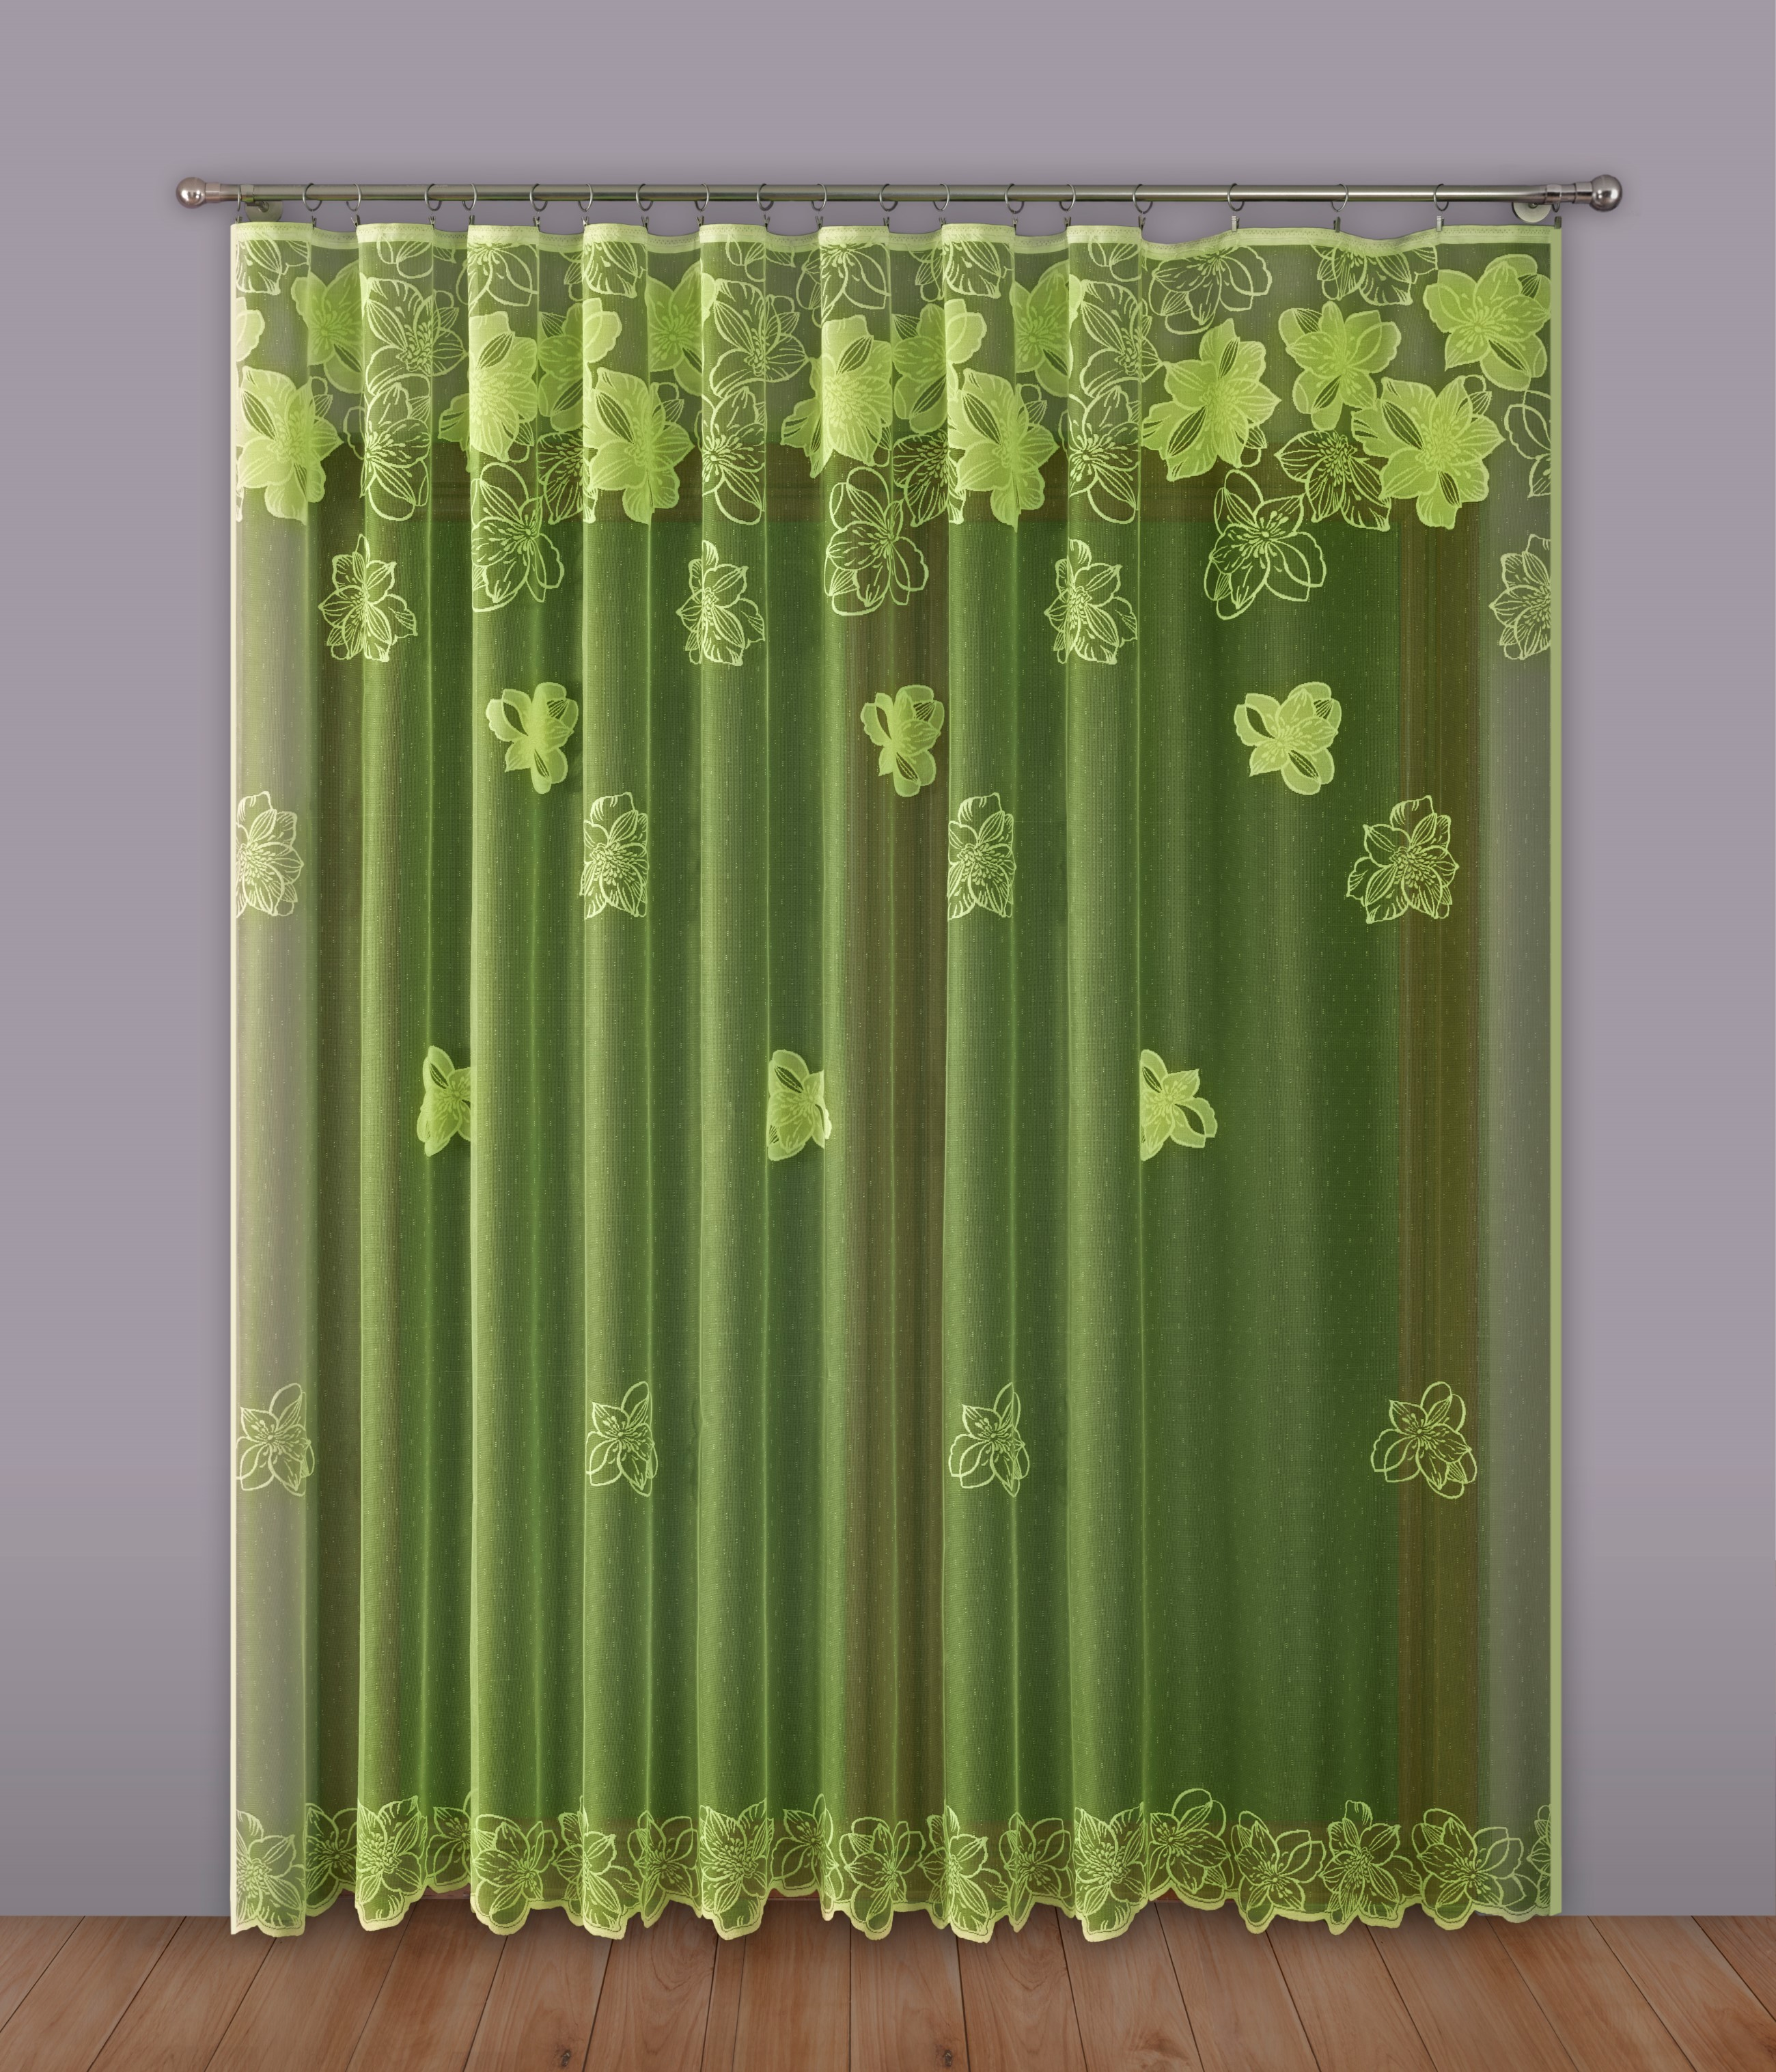 Шторы Primavera Классические шторы Maev Цвет: Салатовый шторы primavera классические шторы maev цвет салатовый